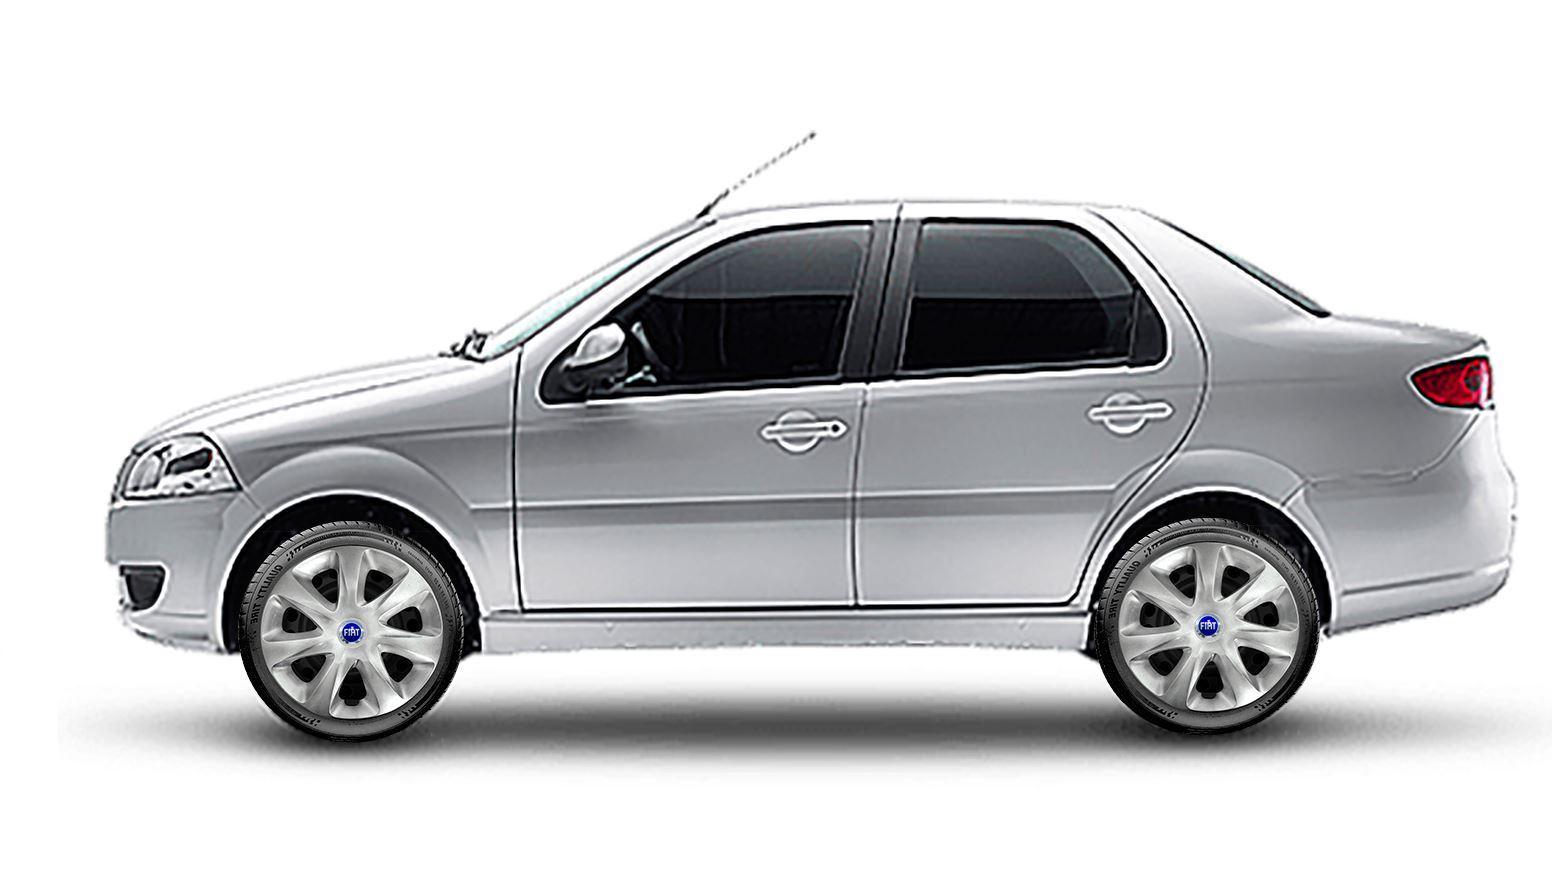 Calota Aro 13 Fiat Palio Siena Uno Idea Punto G186